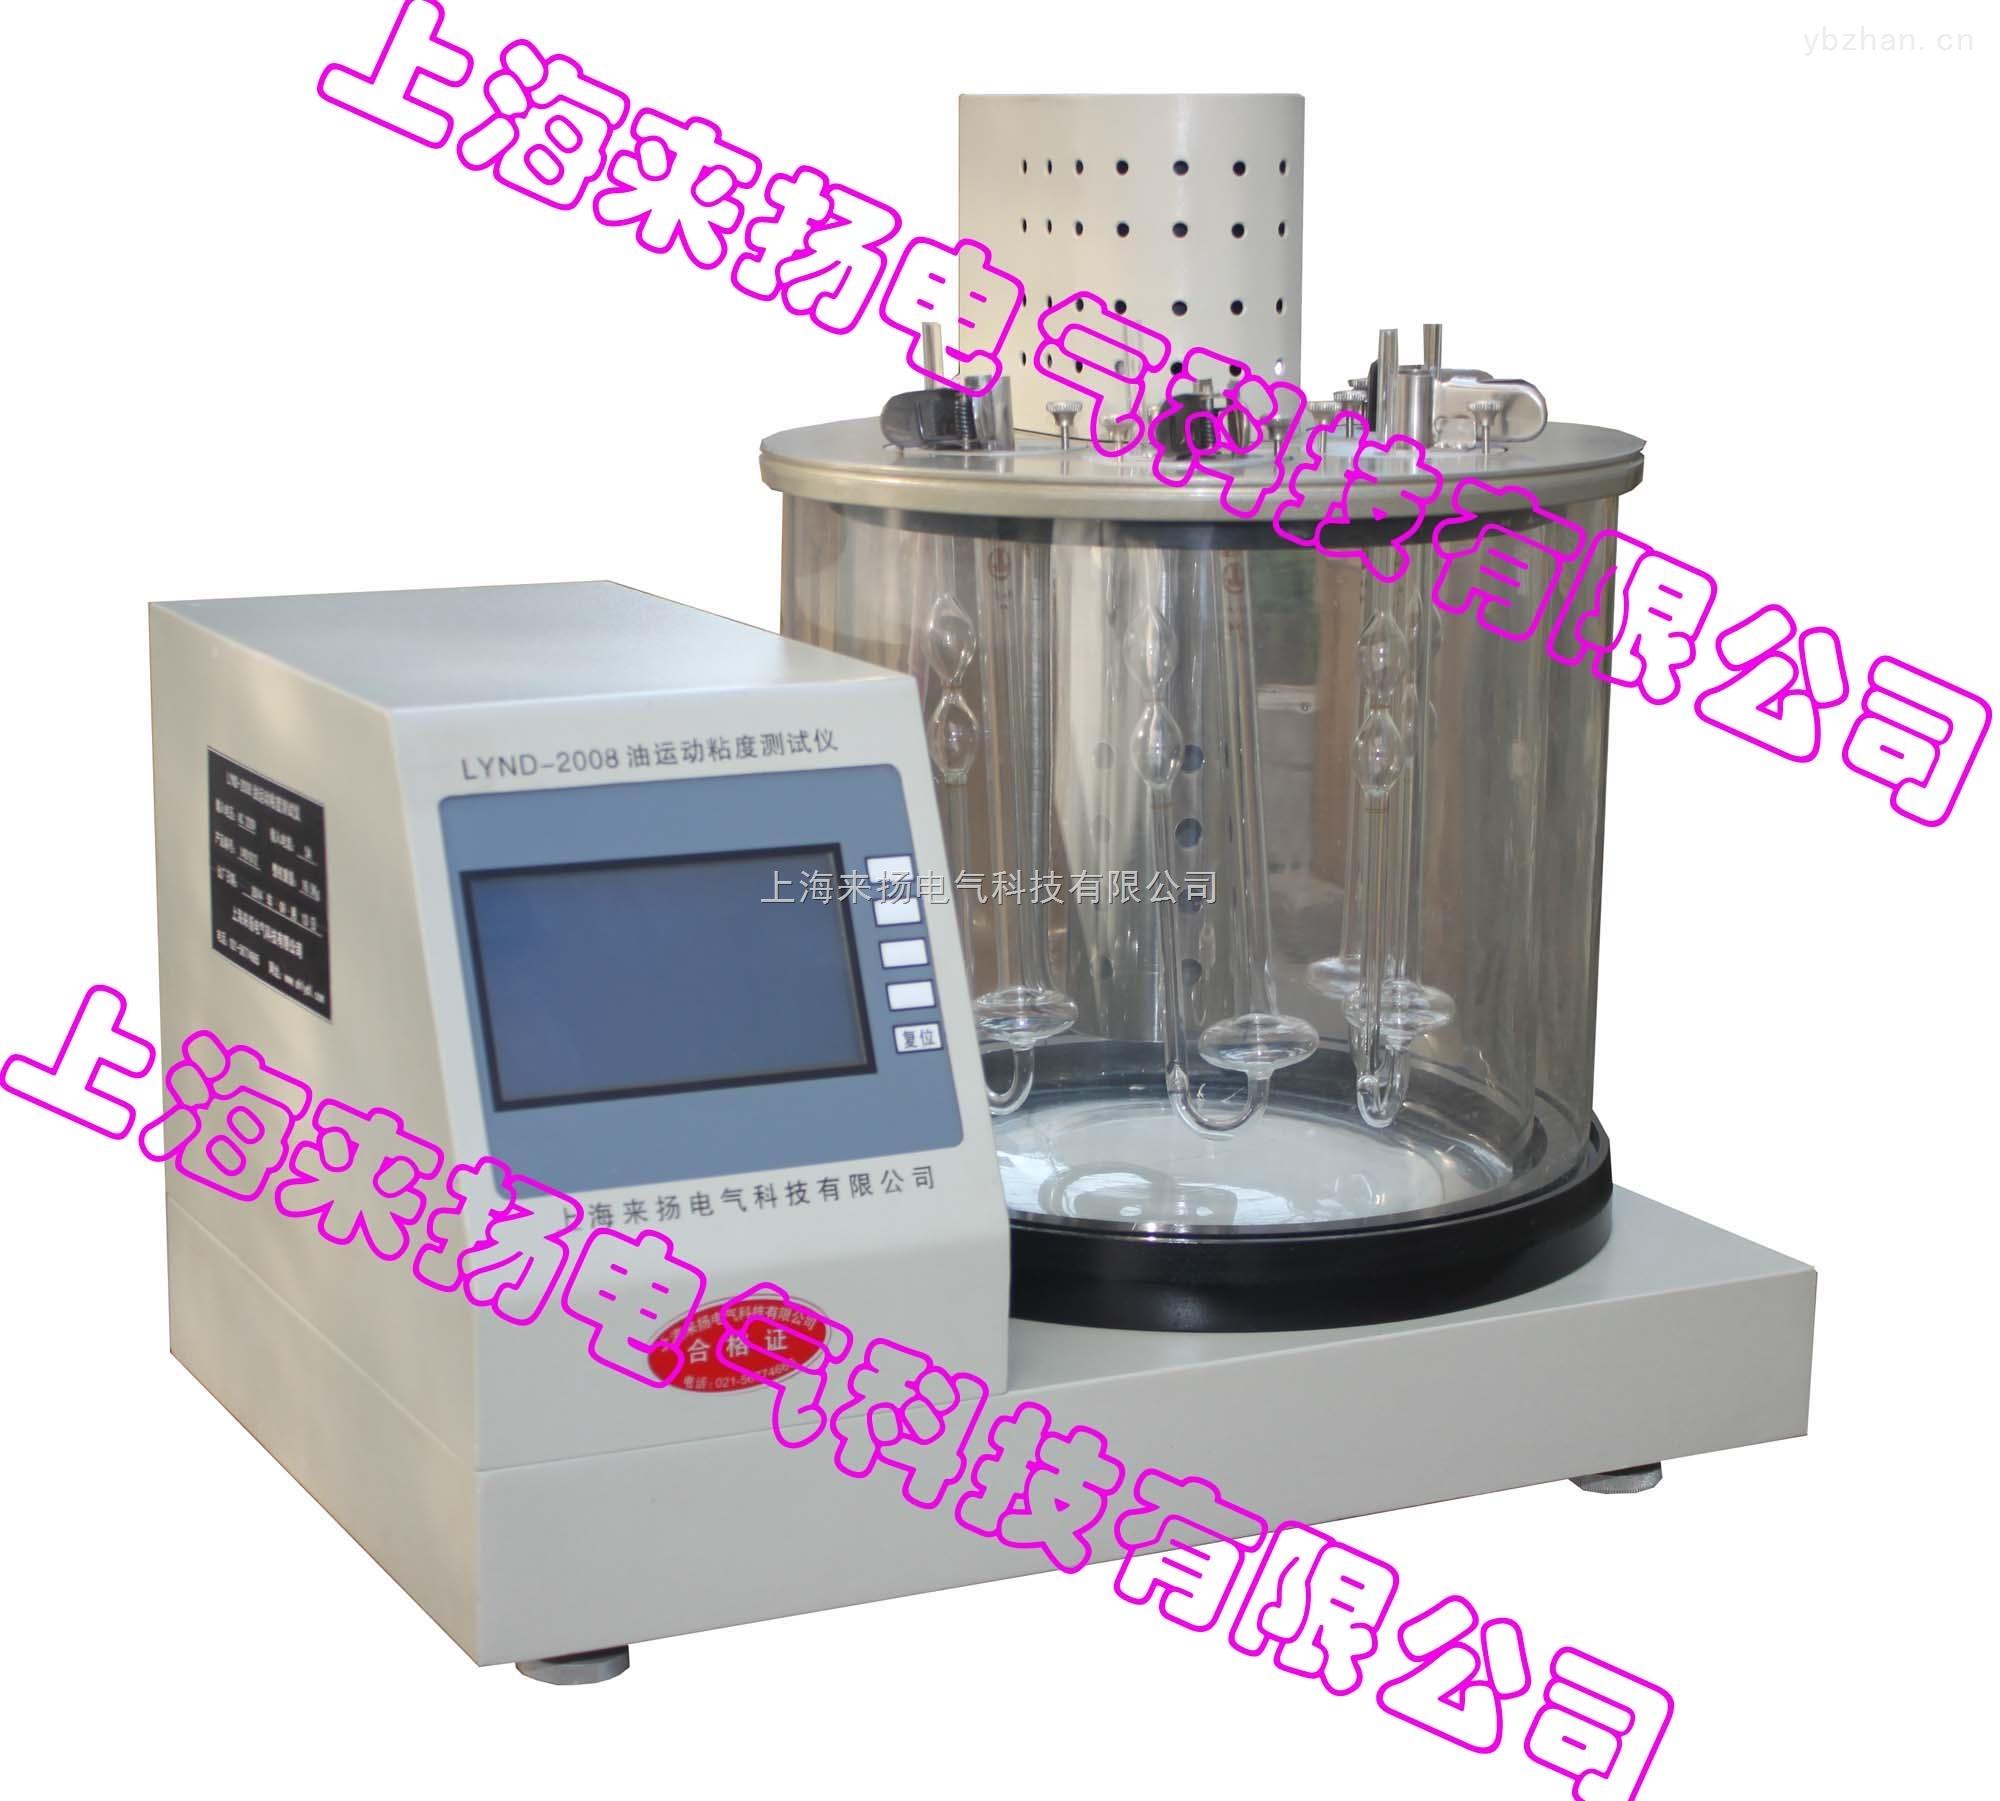 ND-2008-油泡沫分析仪